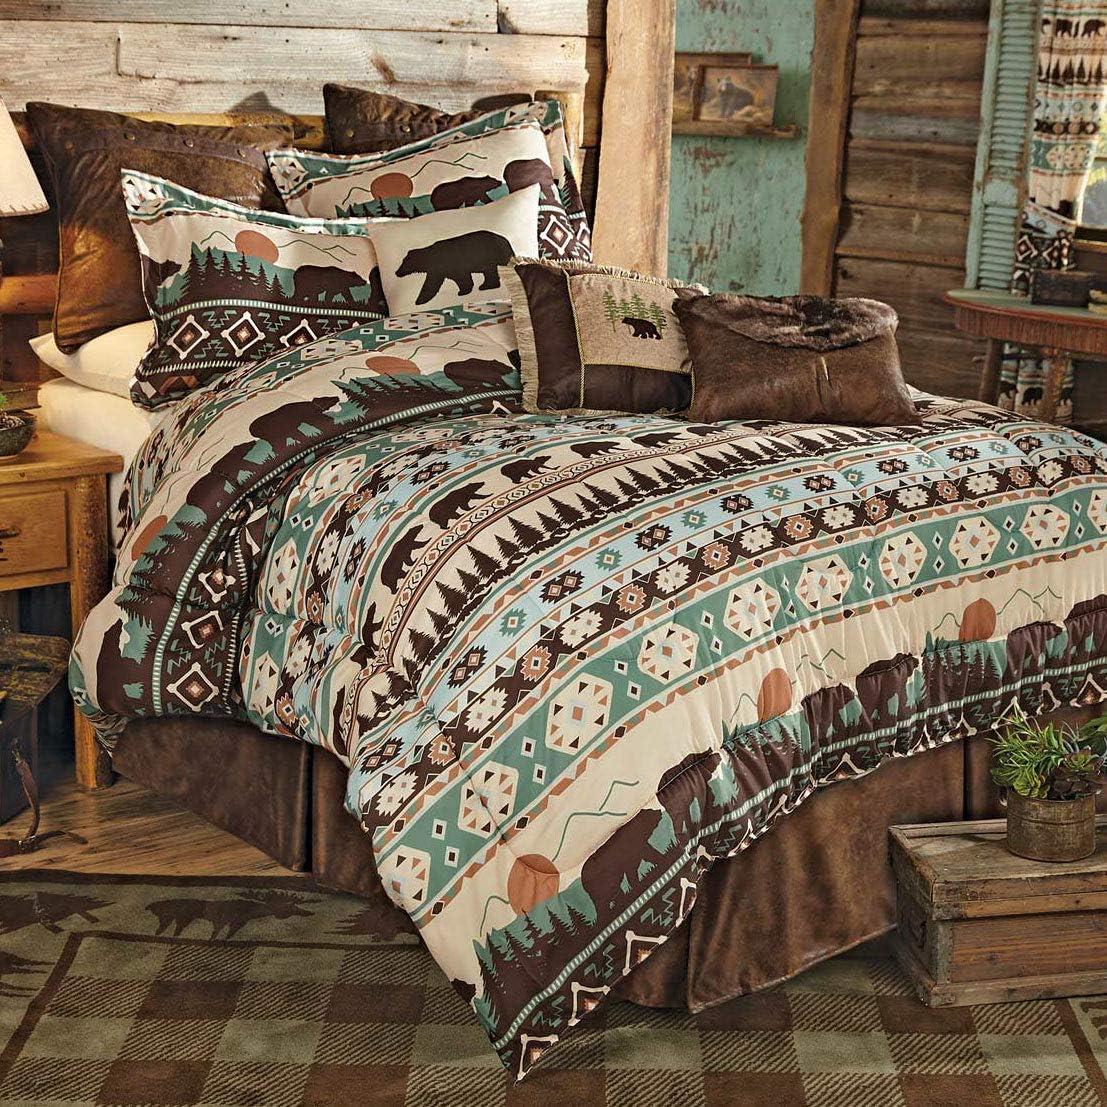 BLACK FOREST DECOR Sierra Mountain Bear Bed Set - King